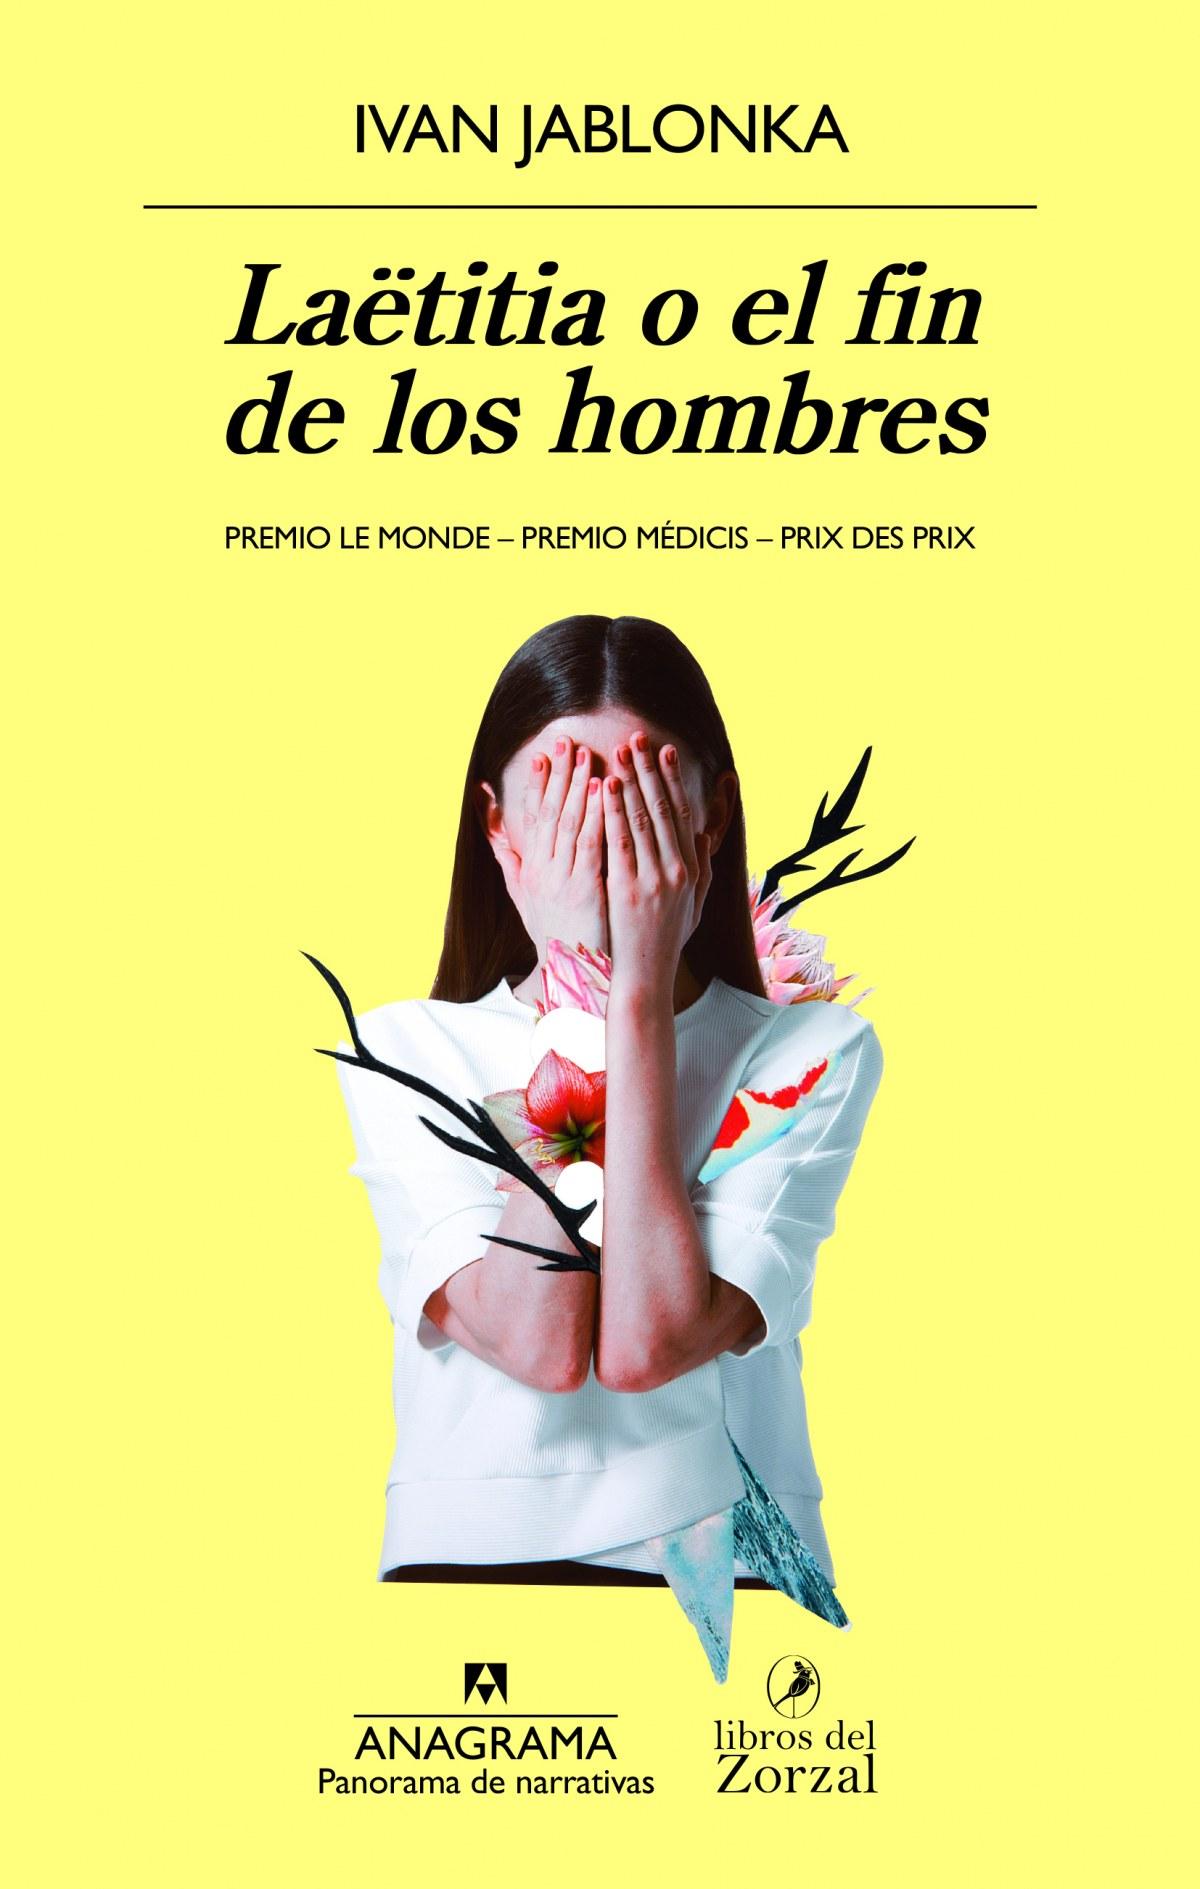 LAëTITIA O EL FIN DE LOS HOMBRES 9788433979940